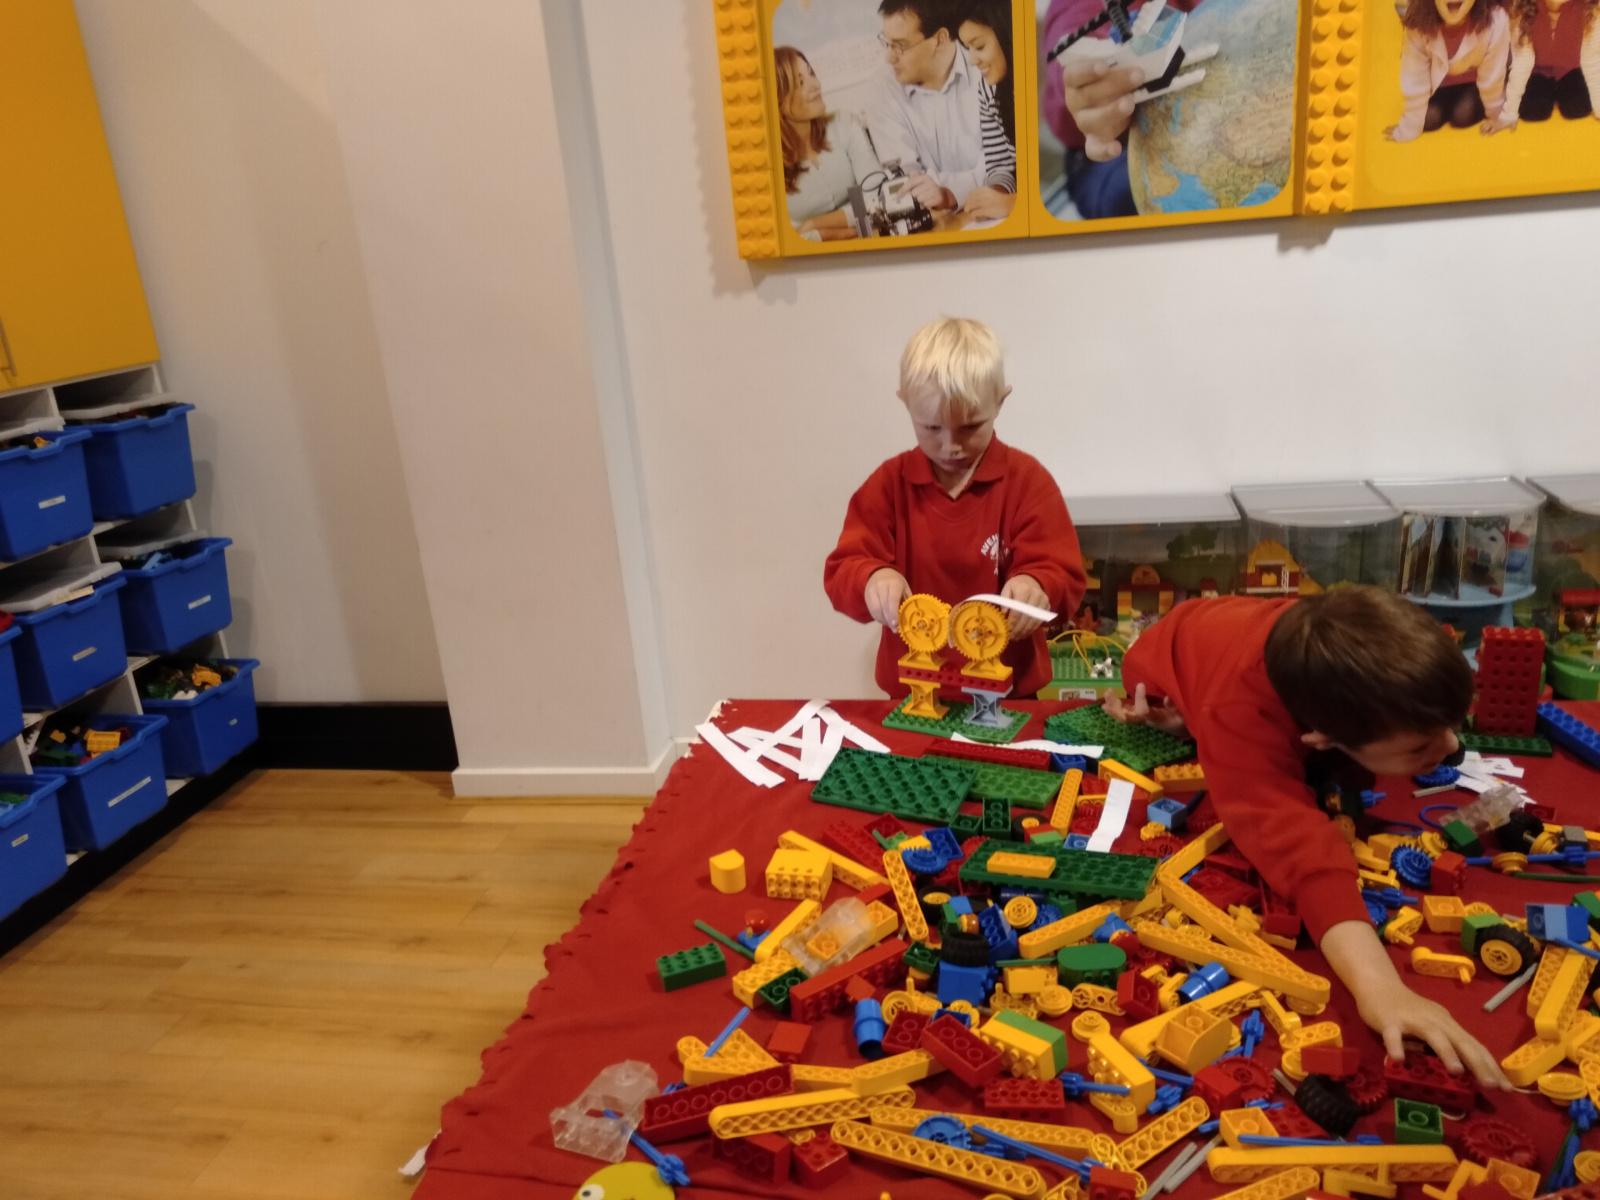 Lego Centre Excursion